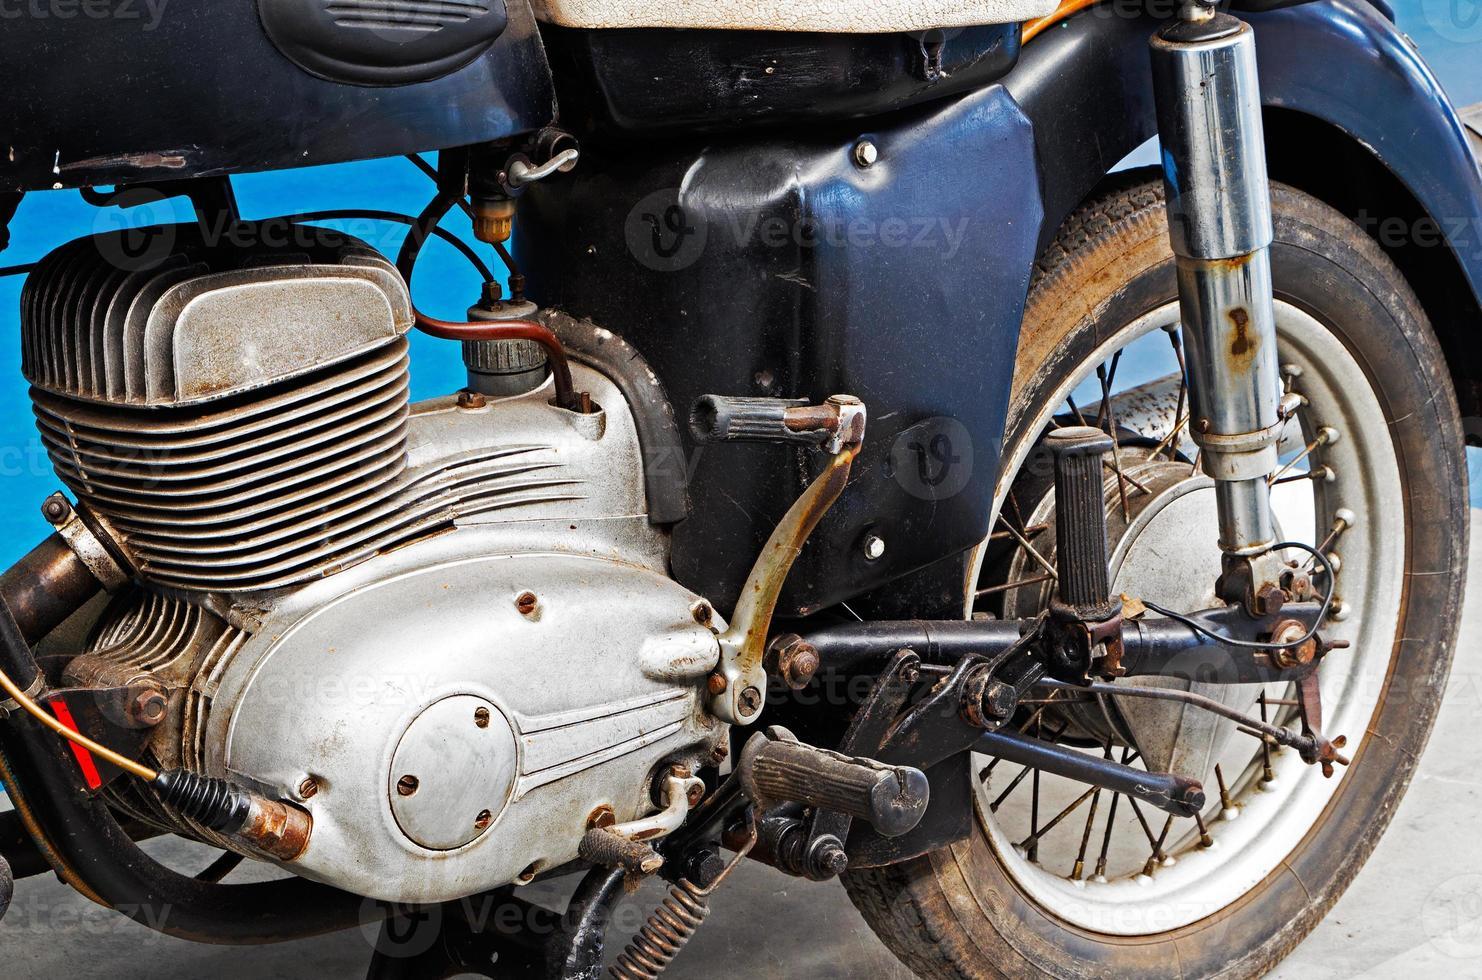 fragmento de una vieja motocicleta oxidada foto